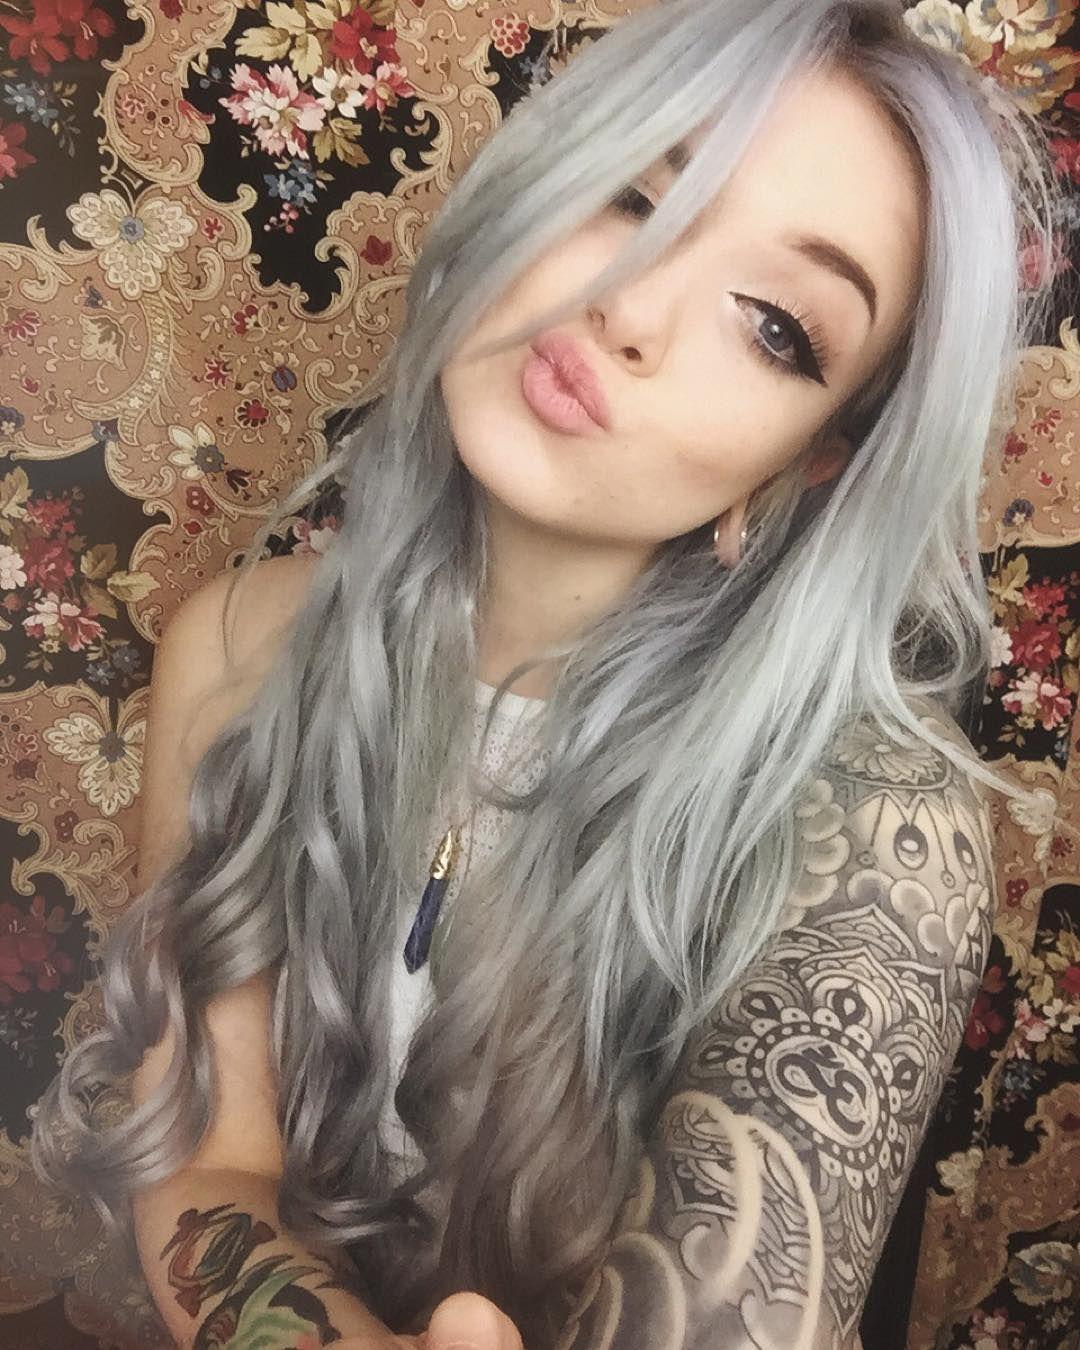 tattoo online dating